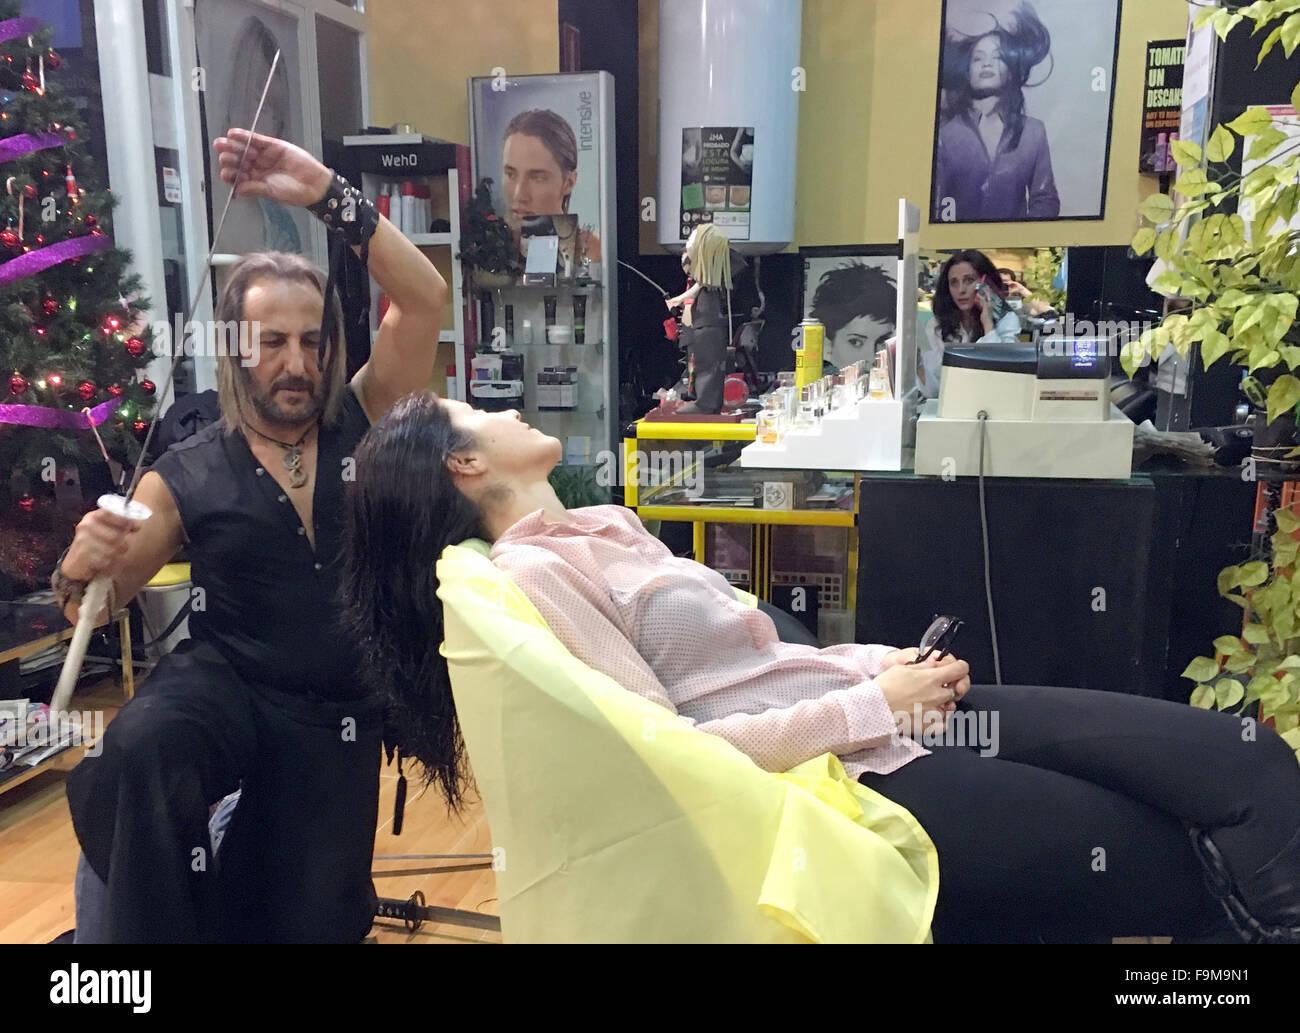 Madrid, Spain. 15th Dec, 2015. Hairdresser Alberto Olmedo (51) cuts Stock Photo: 92030429 - Alamy